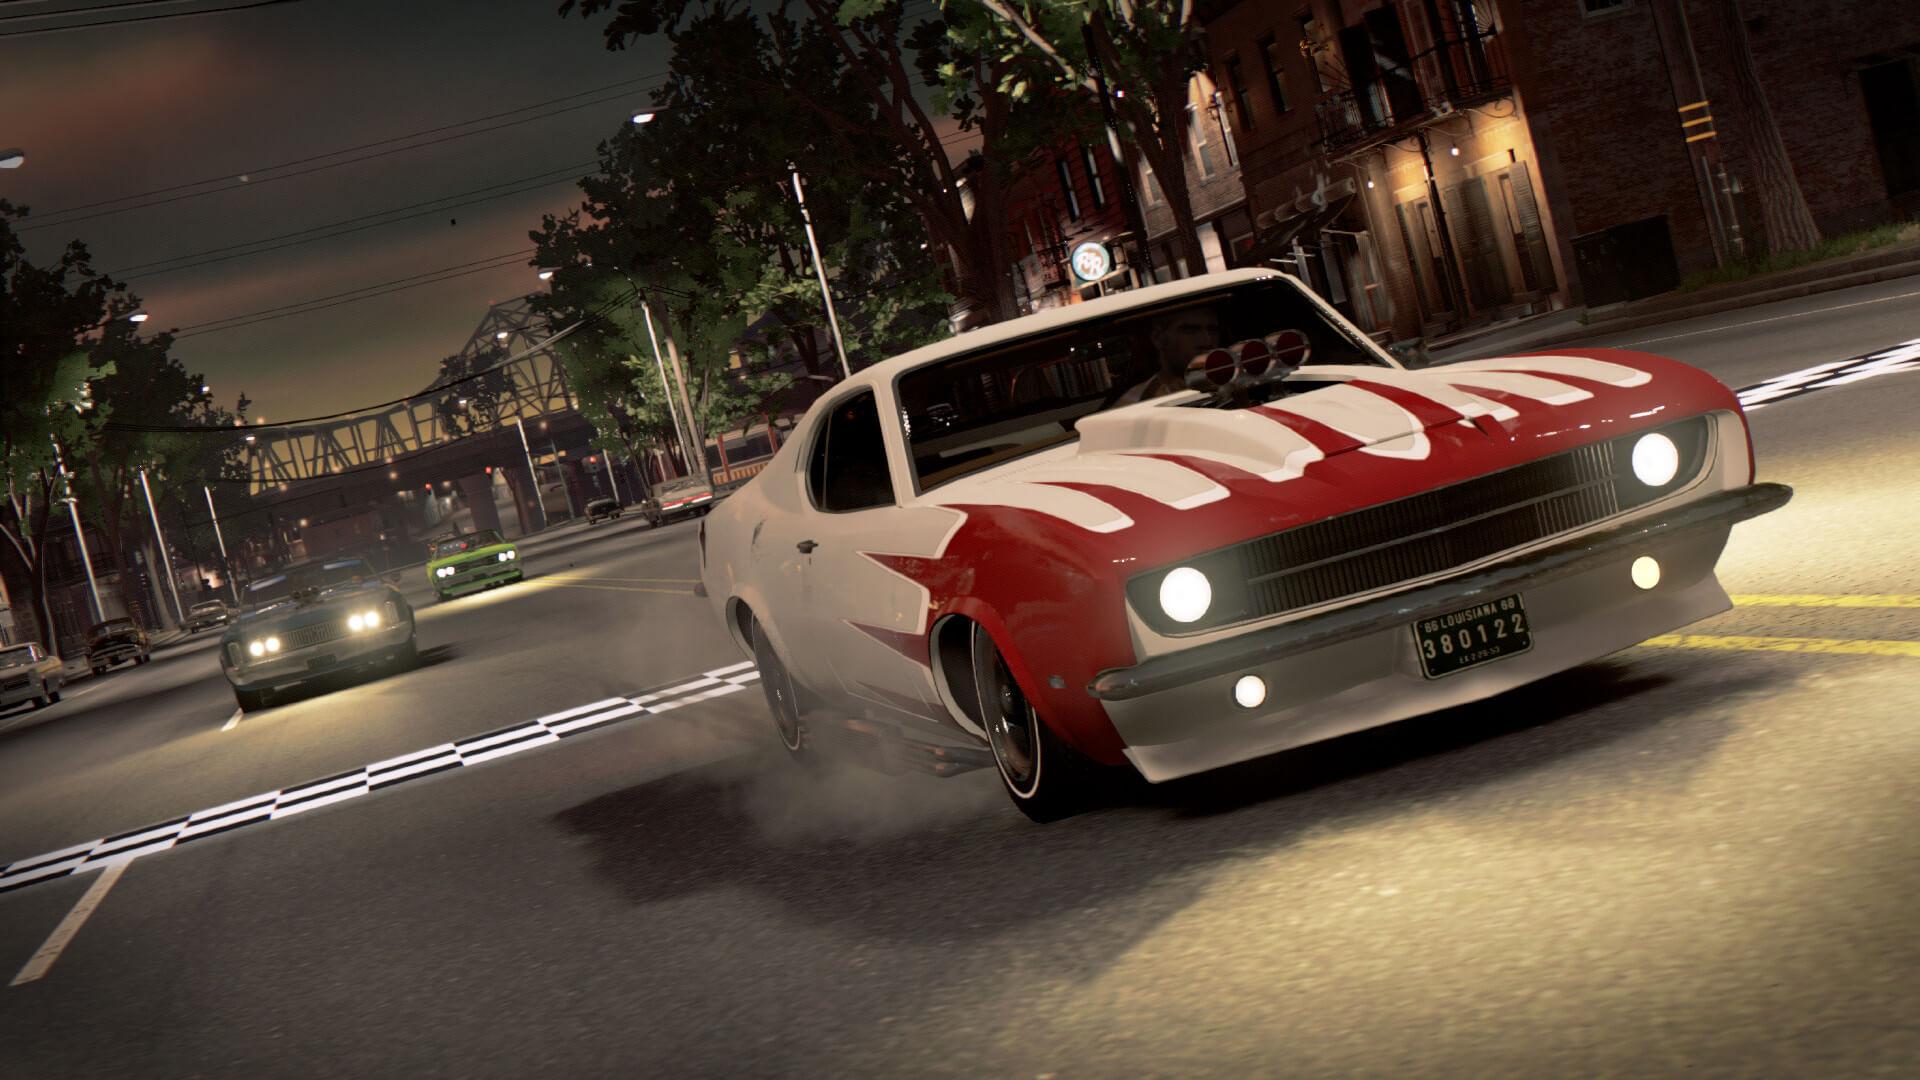 Car Boy Hd Wallpaper Jogo Mafia Iii Para Playstation 4 Dicas An 225 Lise E